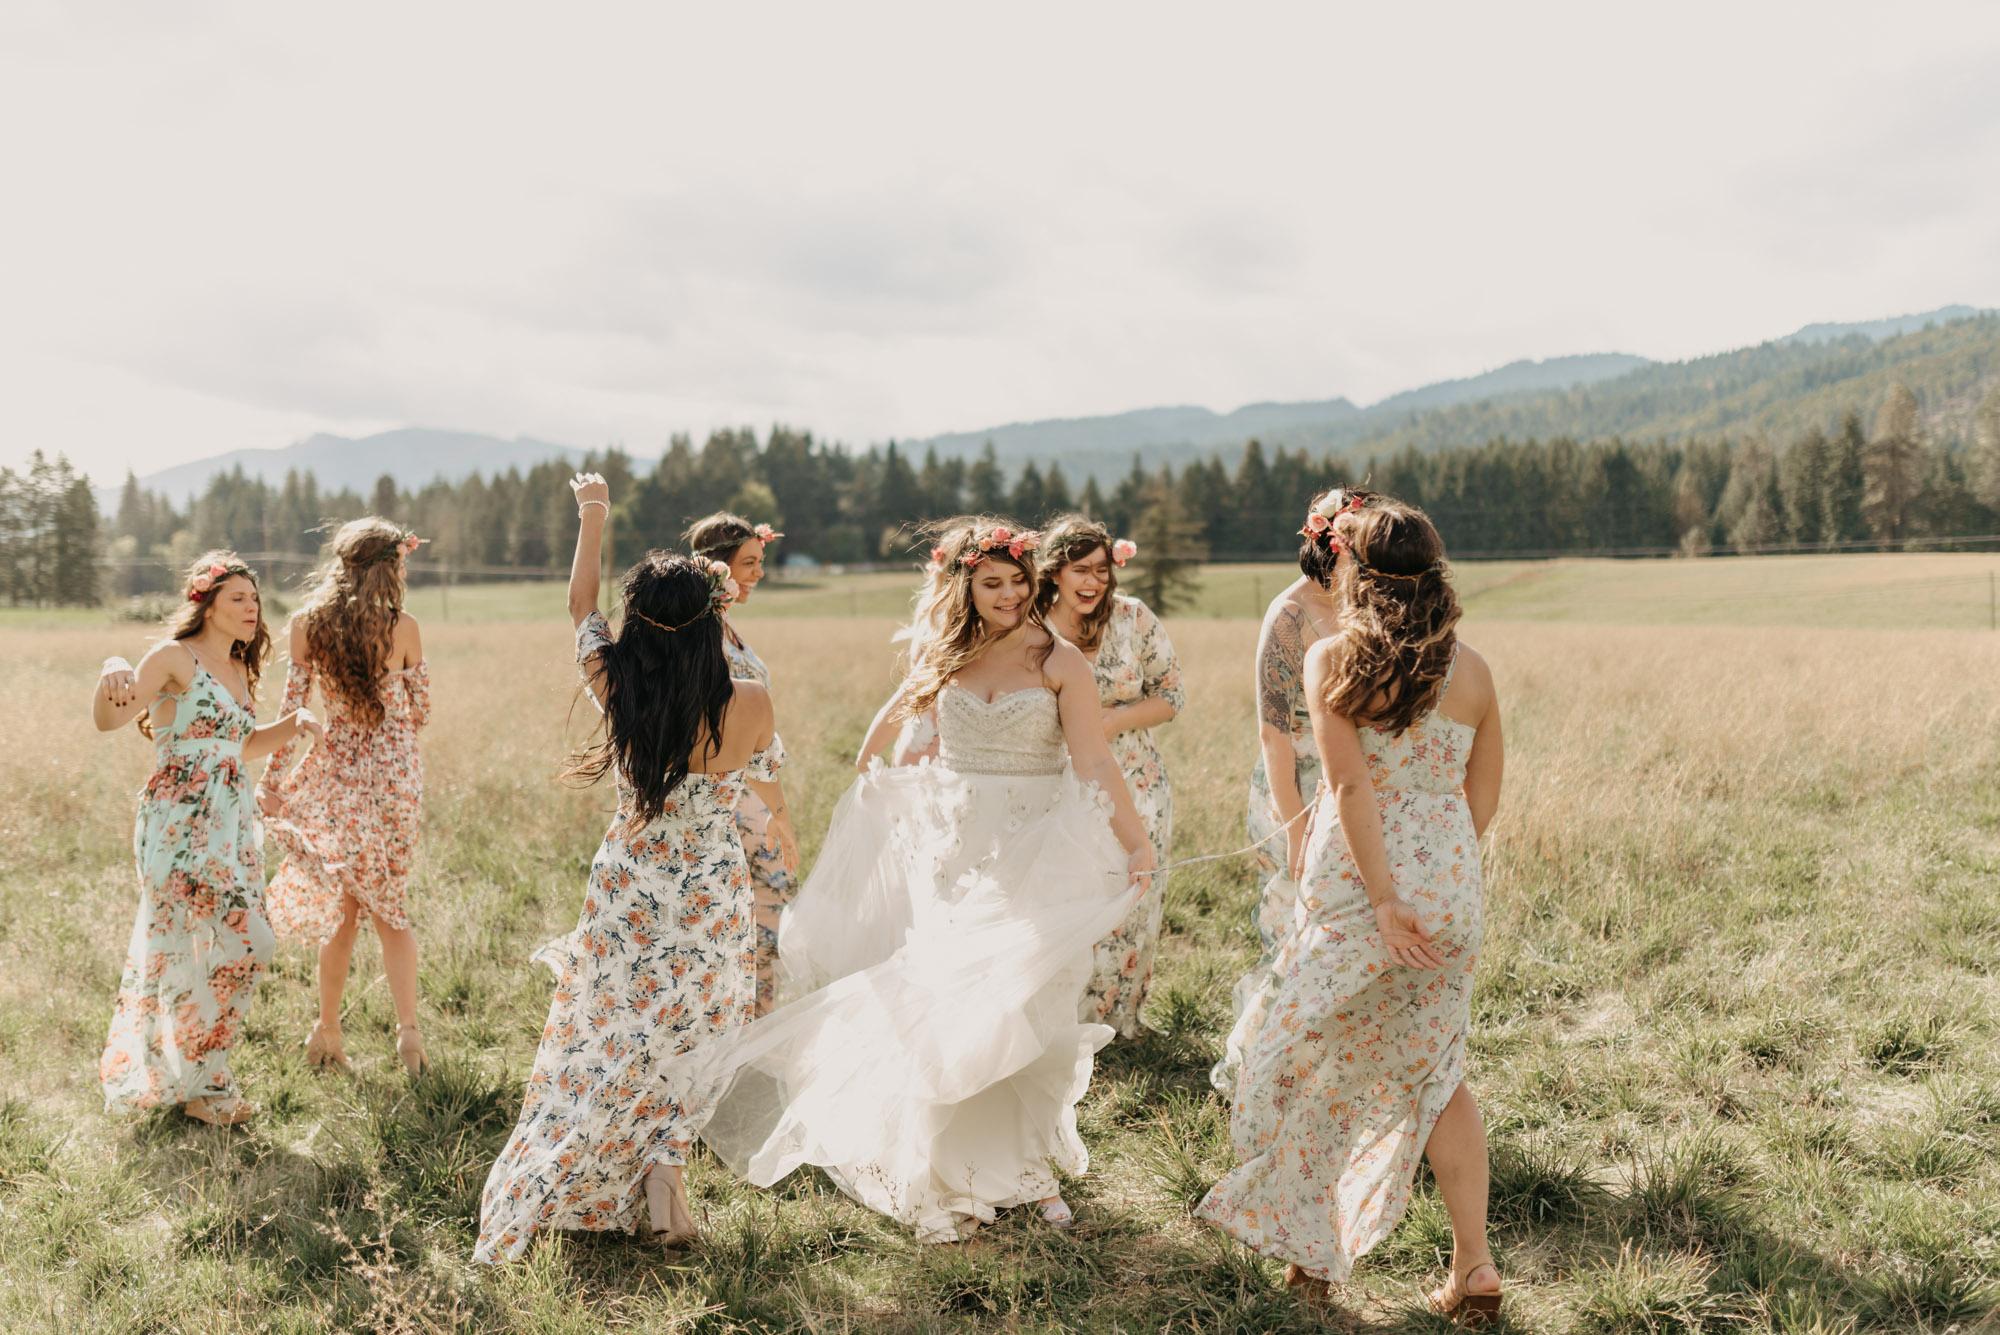 Bridal-Party-Free-People-Flower-Dresses-Washington-Wedding-8558.jpg